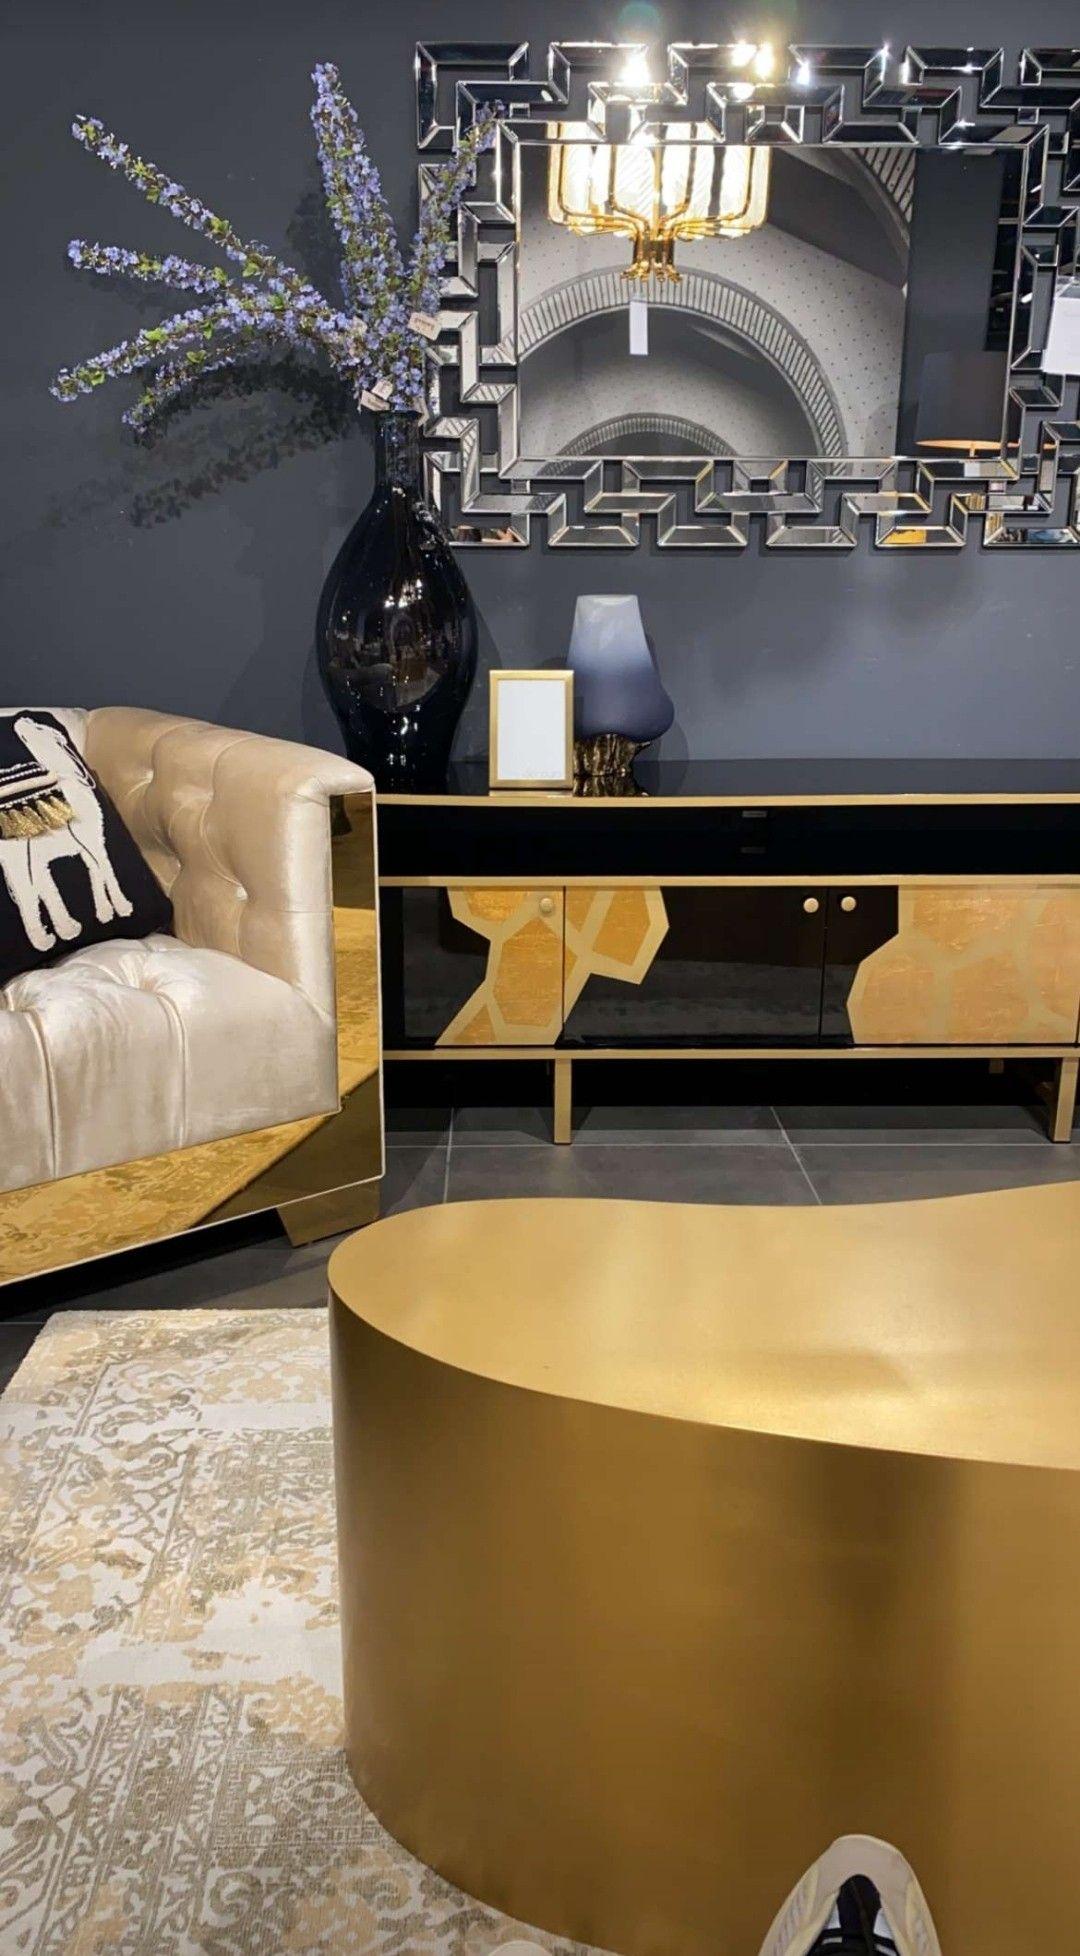 #interiordecorate #homelove #homedesign #pinbyhanan